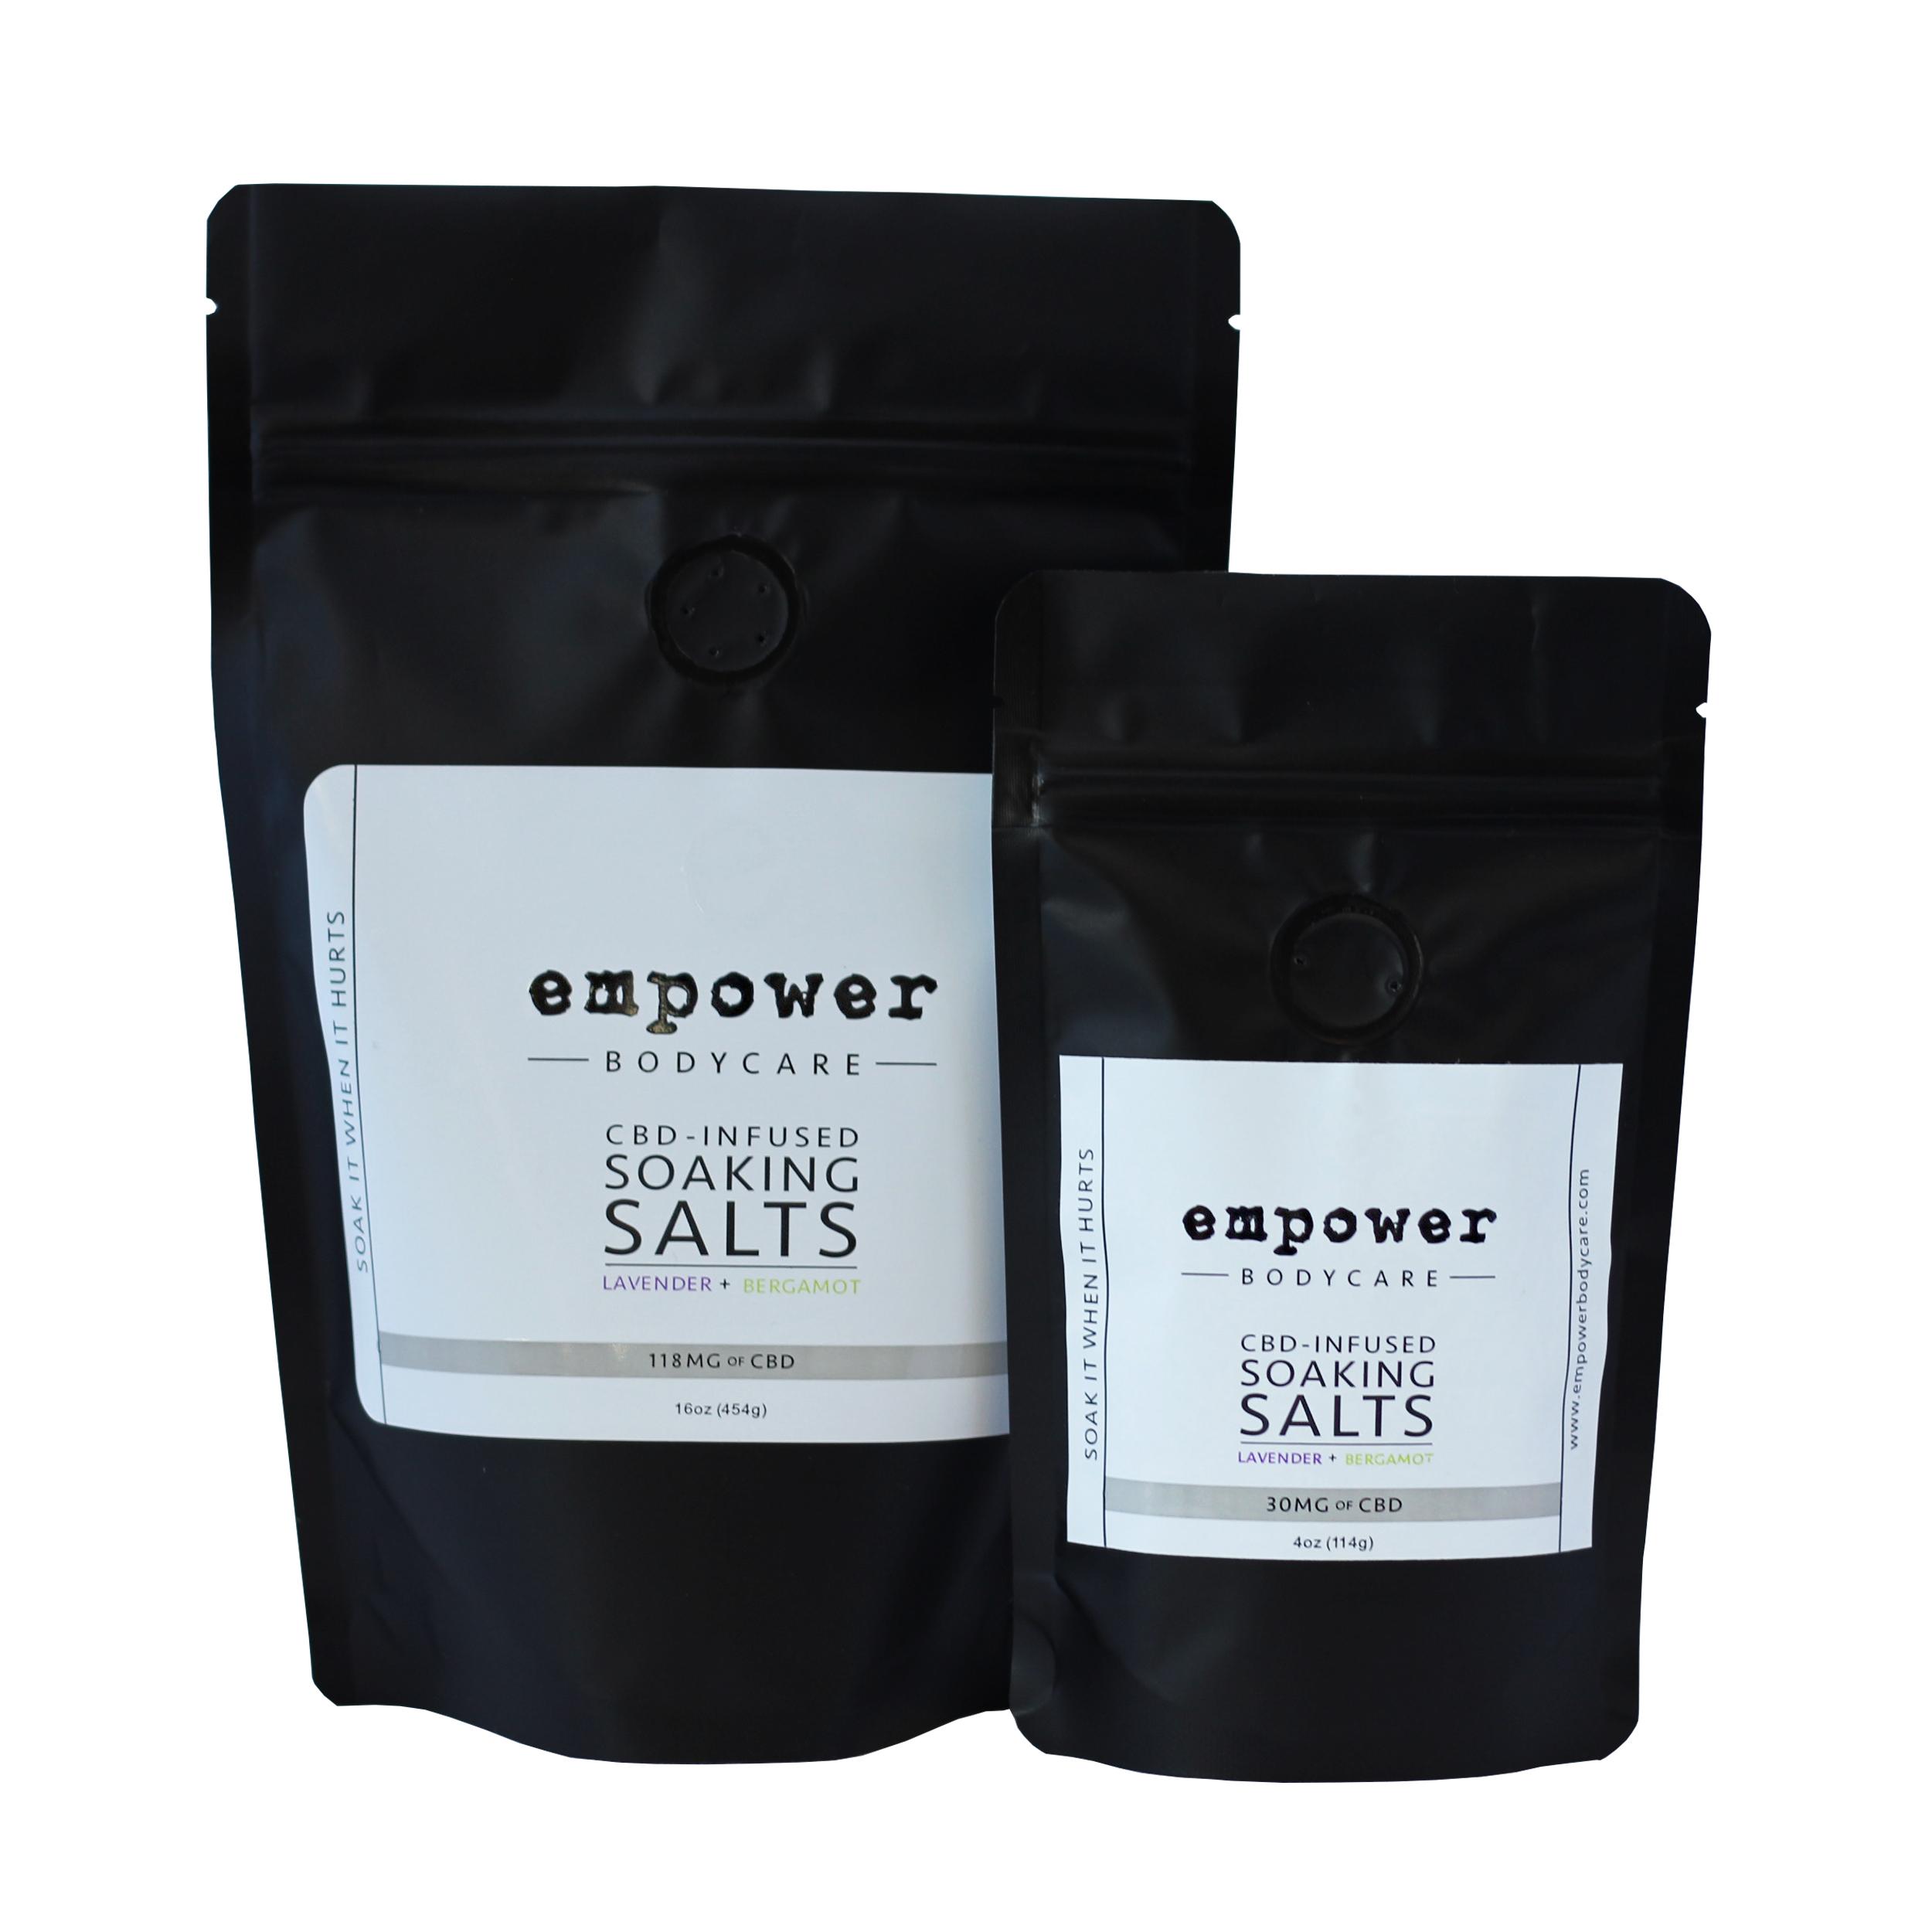 Empower Soaking Salts.jpg